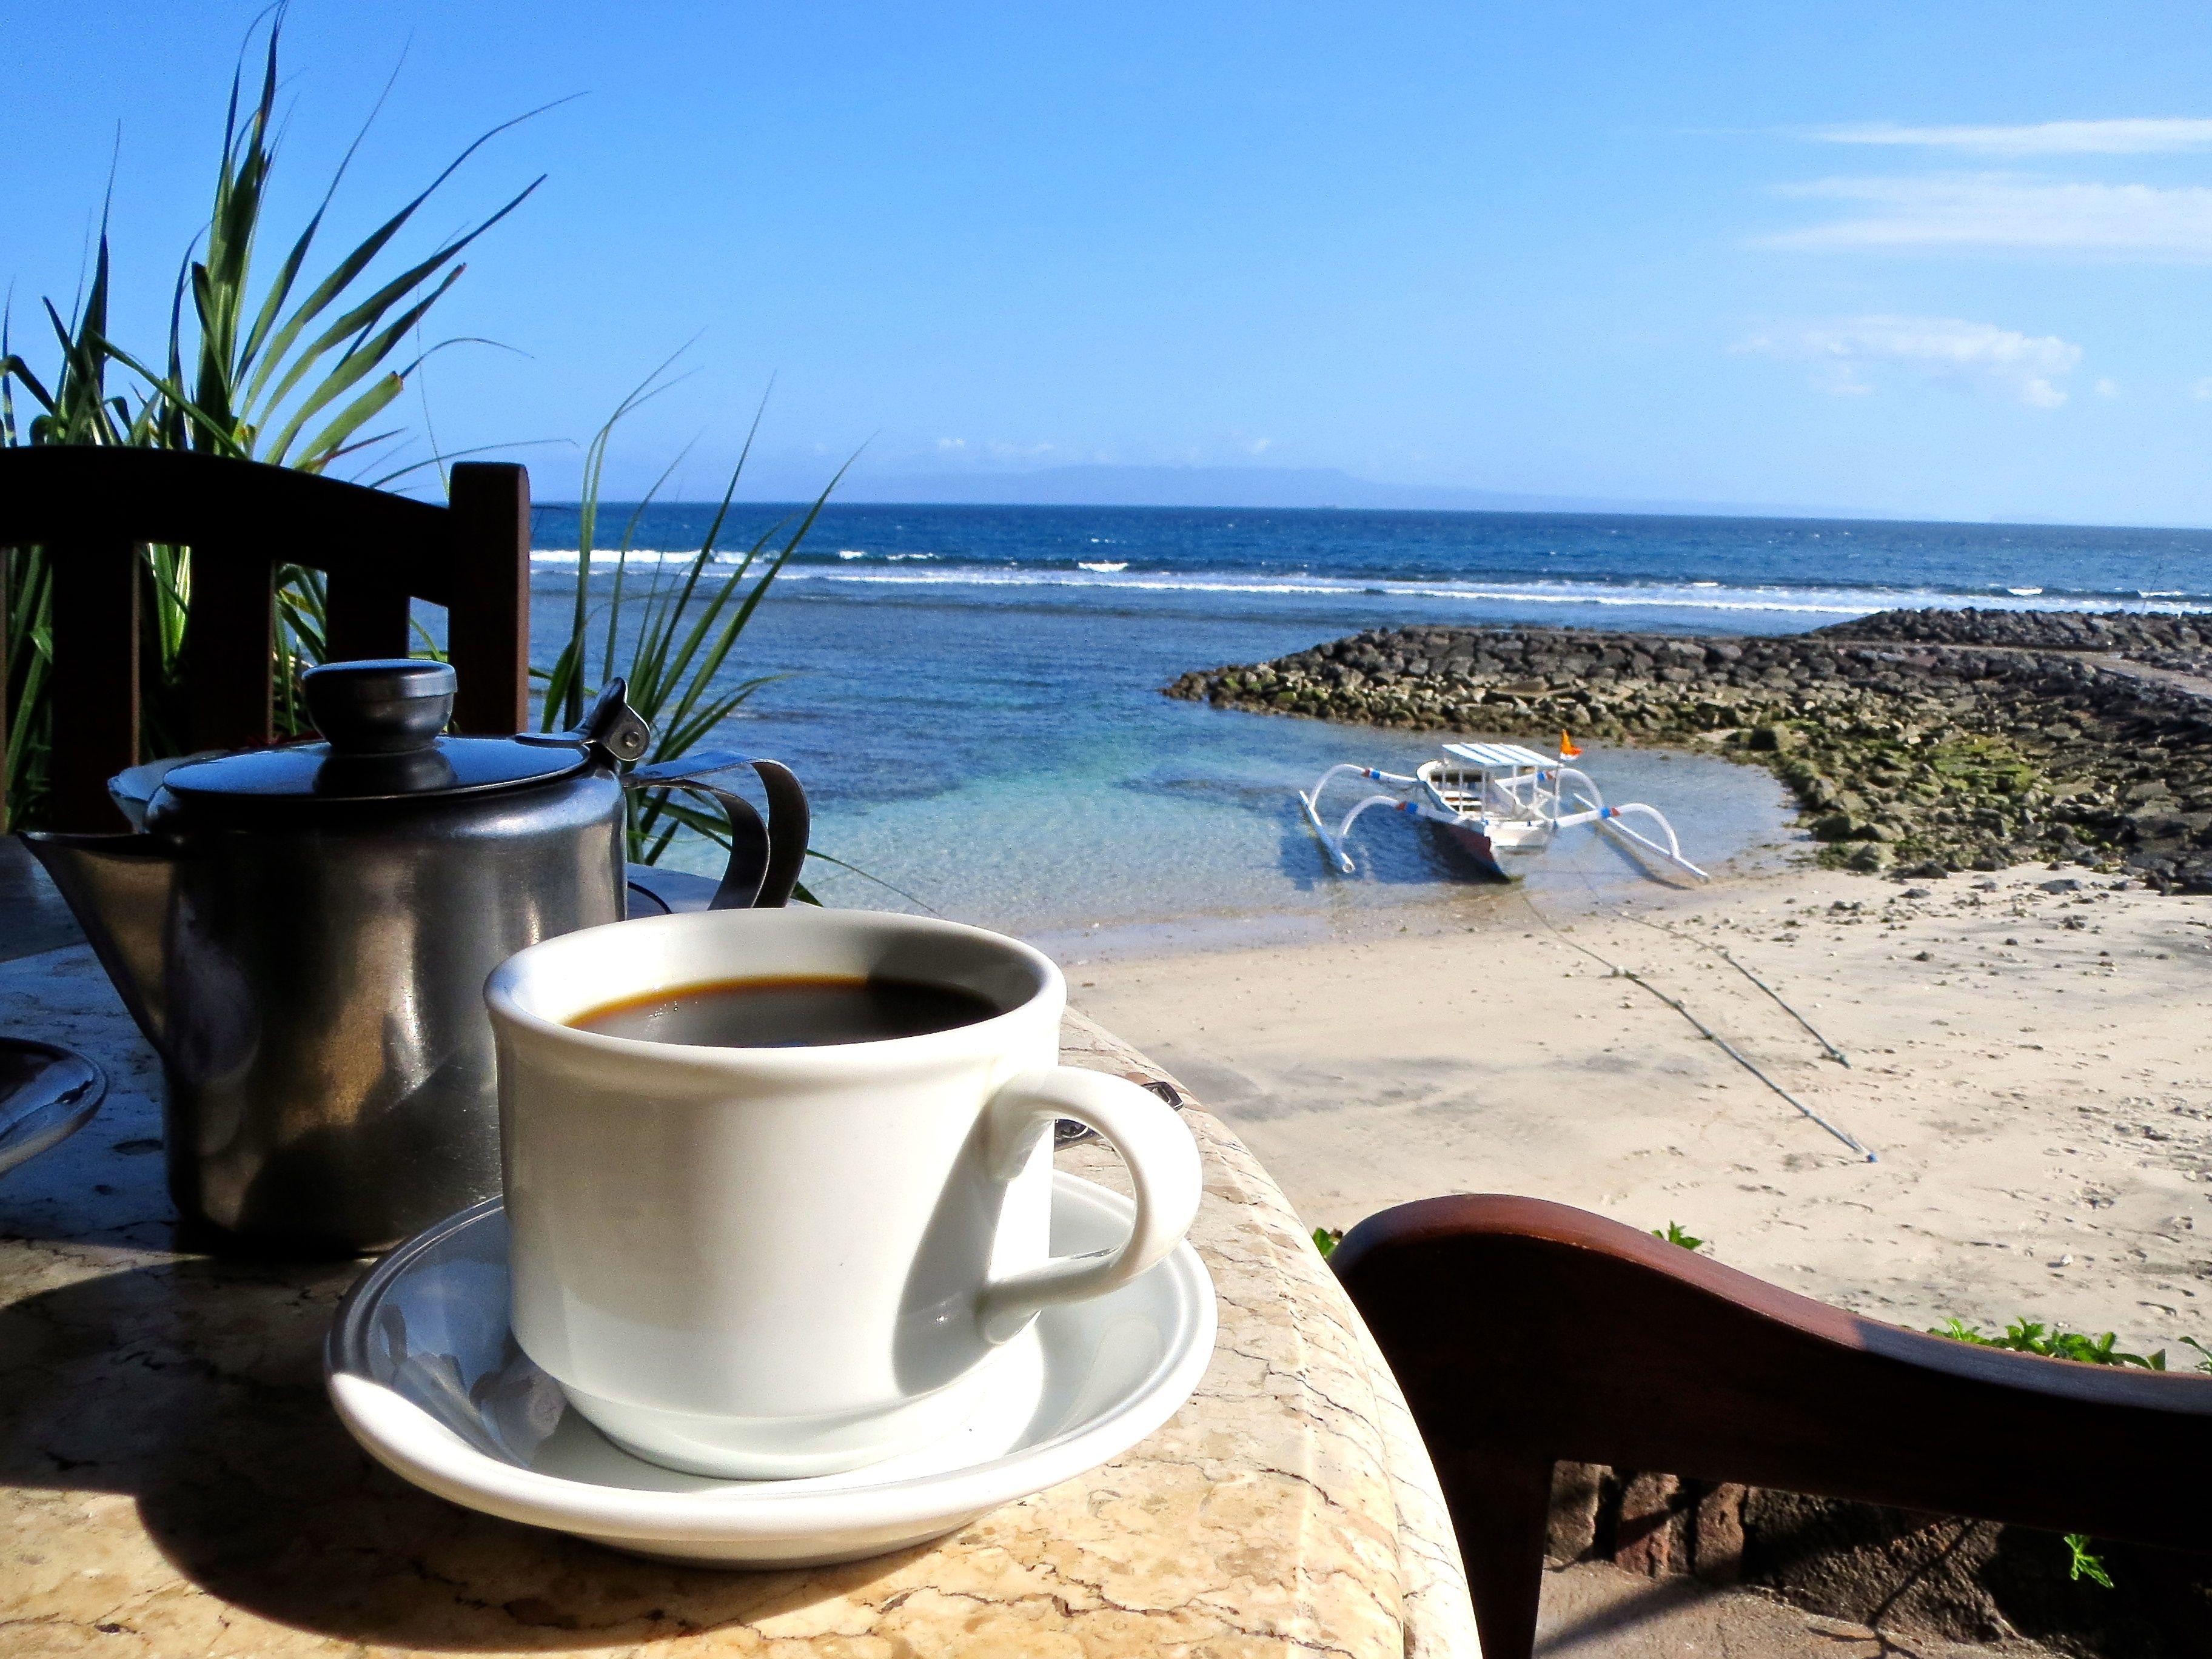 Картинки доброе утро кофе и море